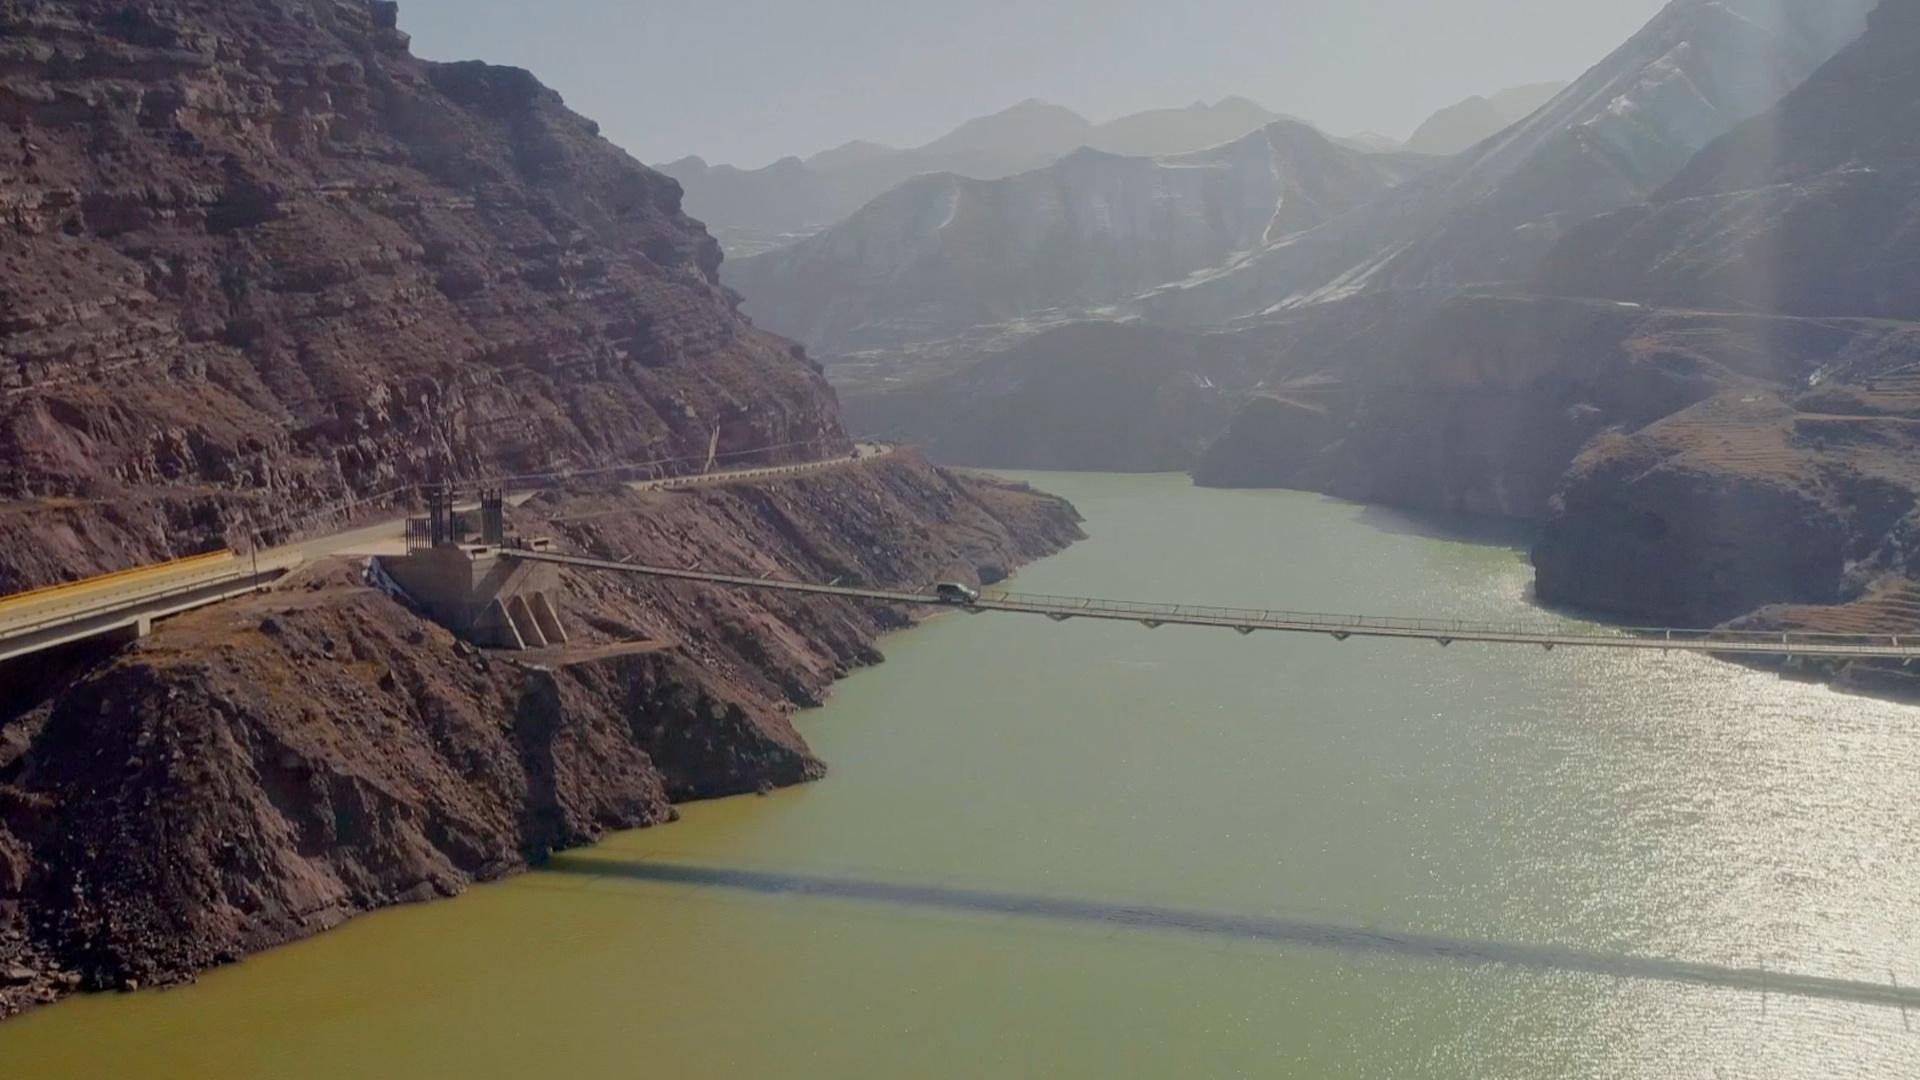 In Qinghai Province, China, Geoarcheologist Qinglong Wu crosses the Jishi Gorge by car.